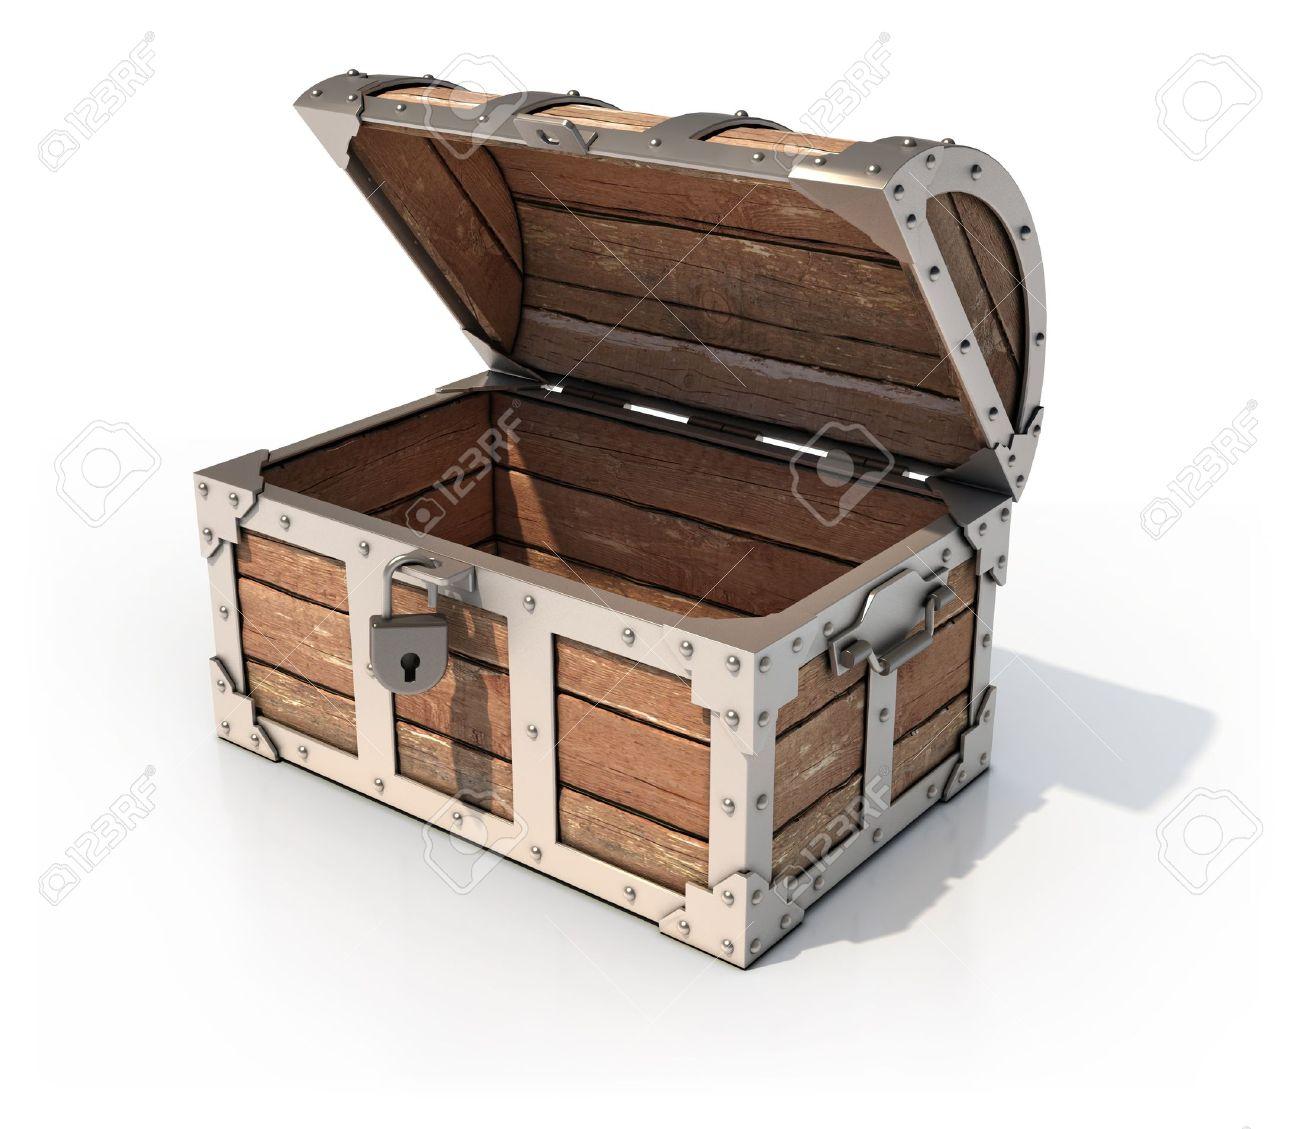 empty treasure chest 3d illustration Stock Photo - 12557985